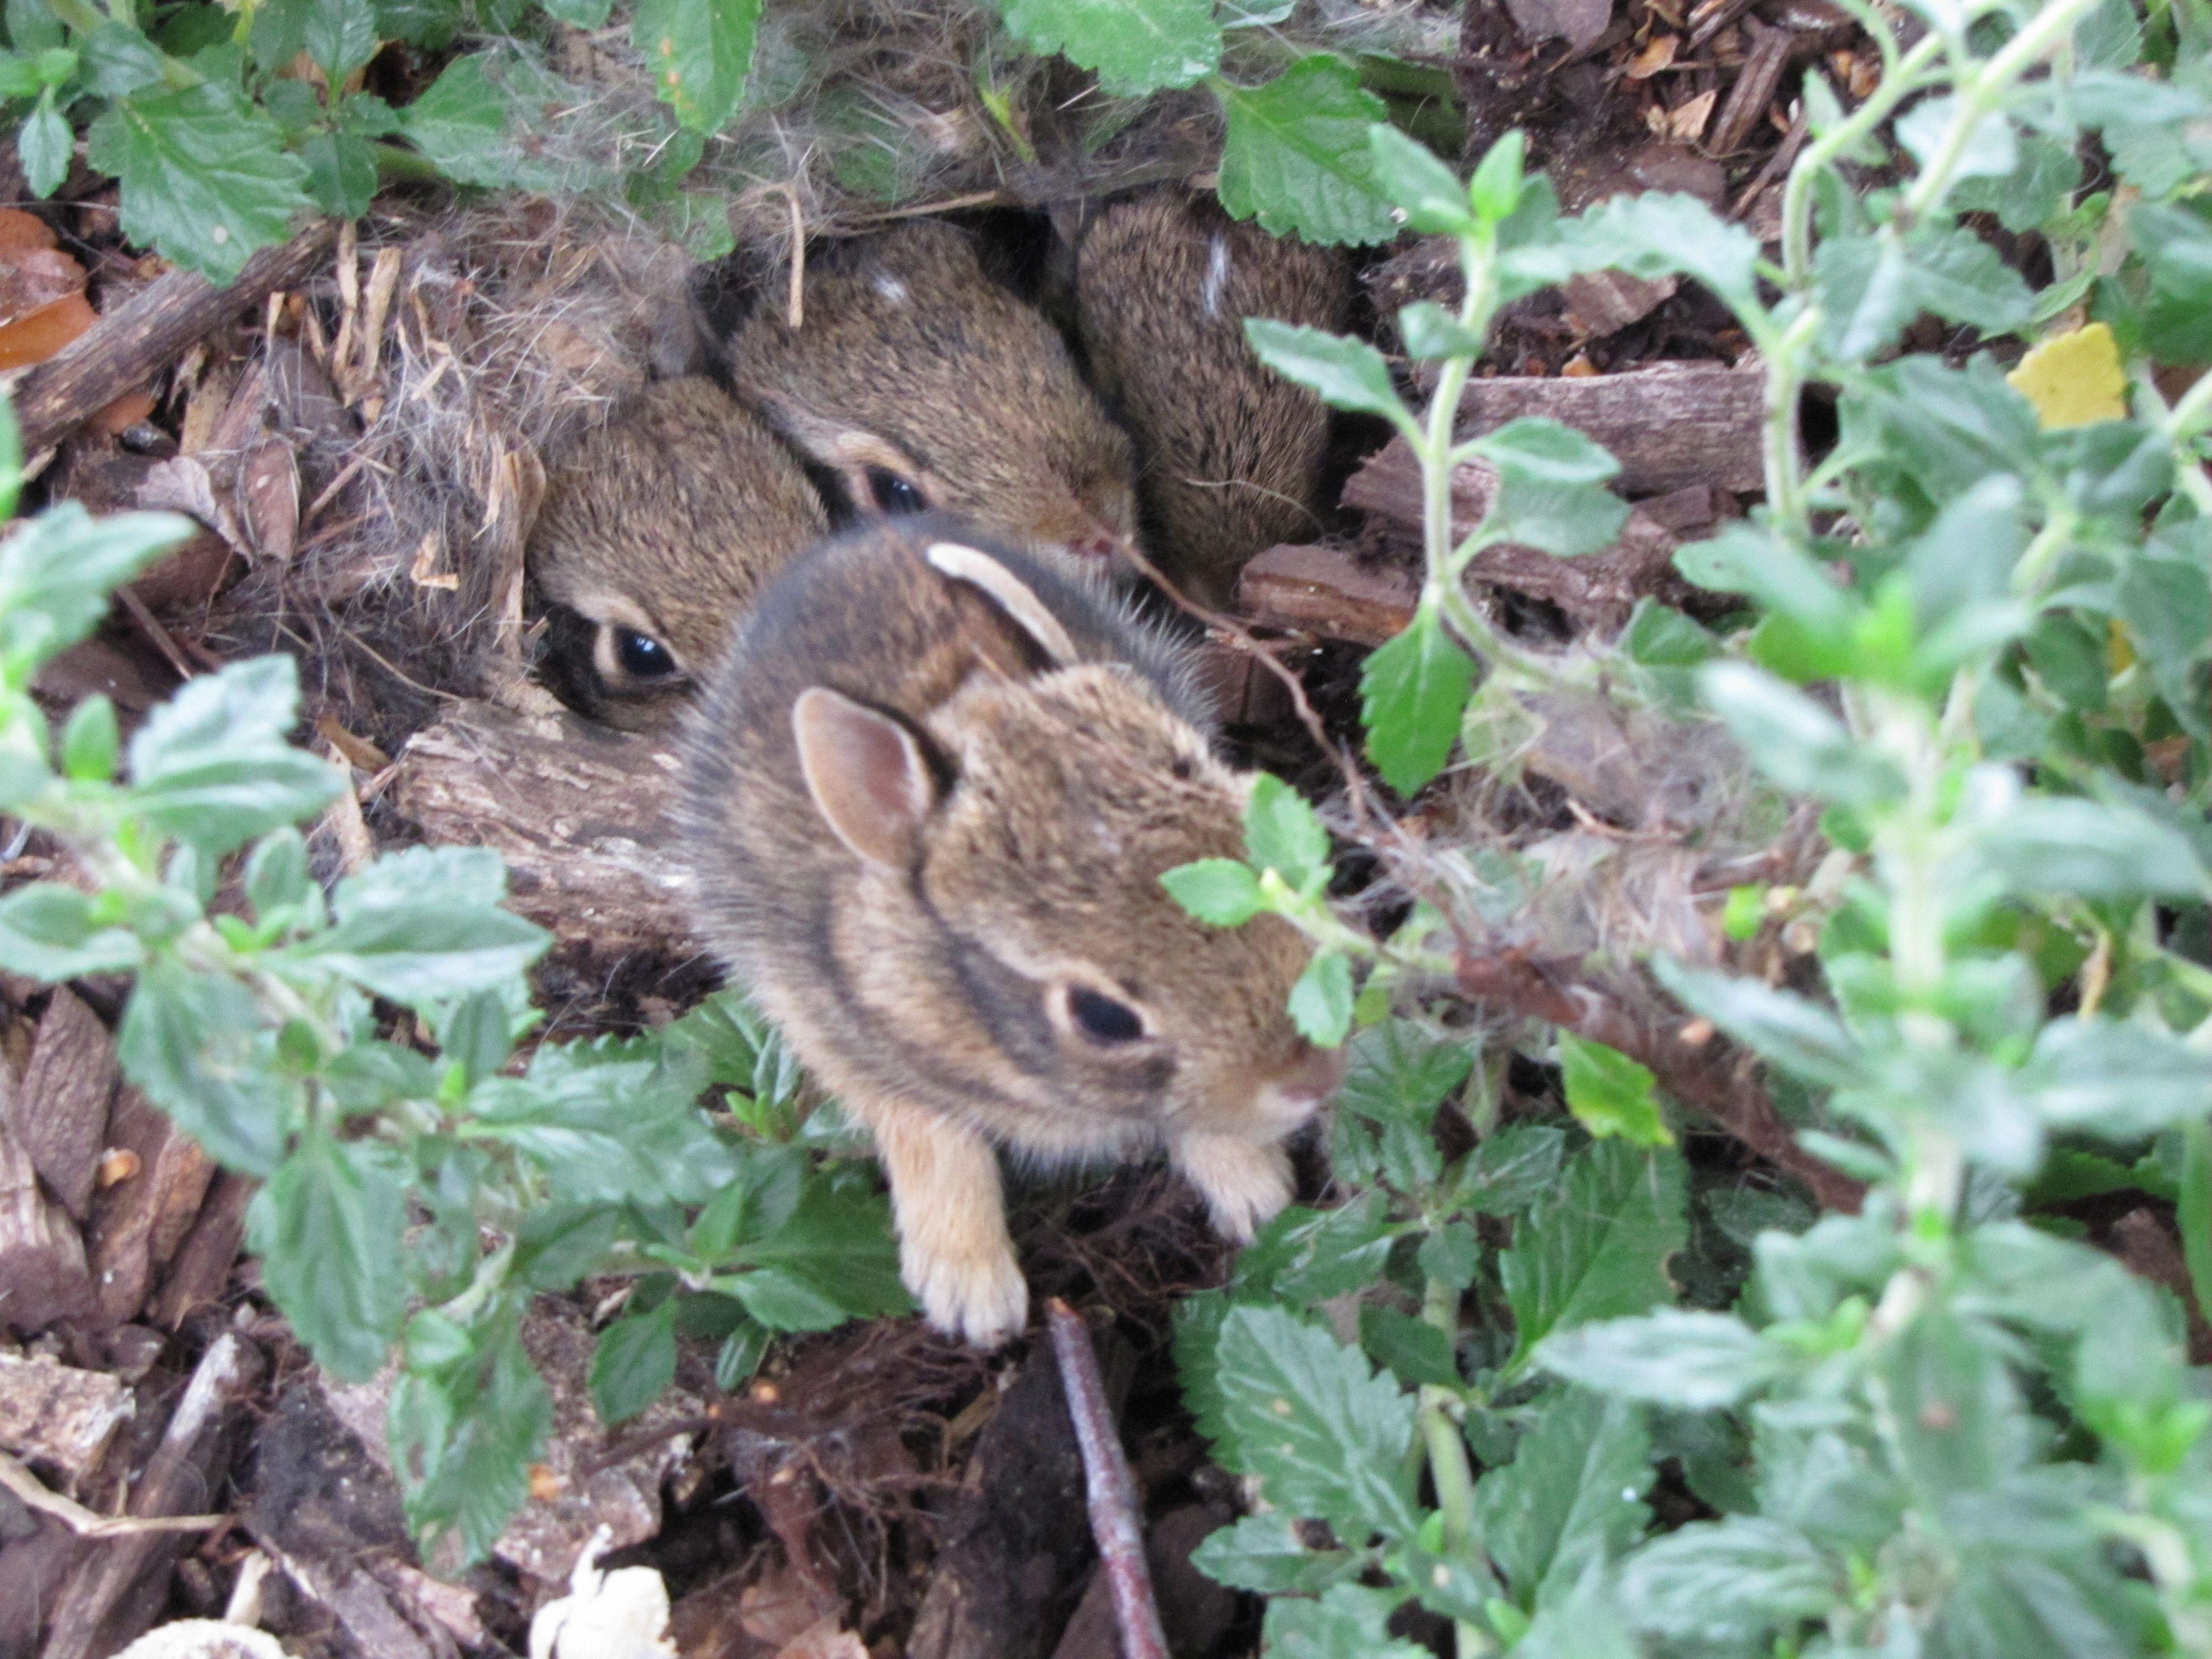 Baby bunnies in my backyard | Baby bunnies, Animals, Critter